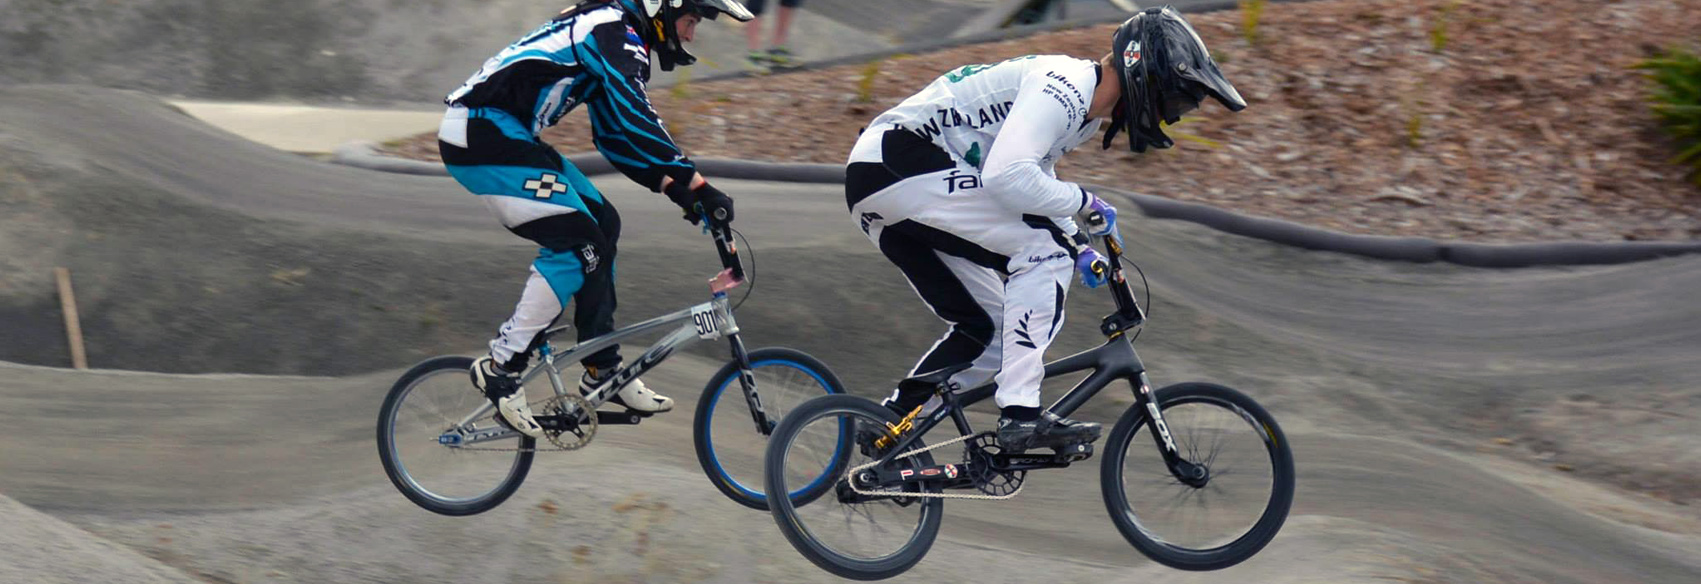 Trent Jones - Trackside BMX Photos NZ